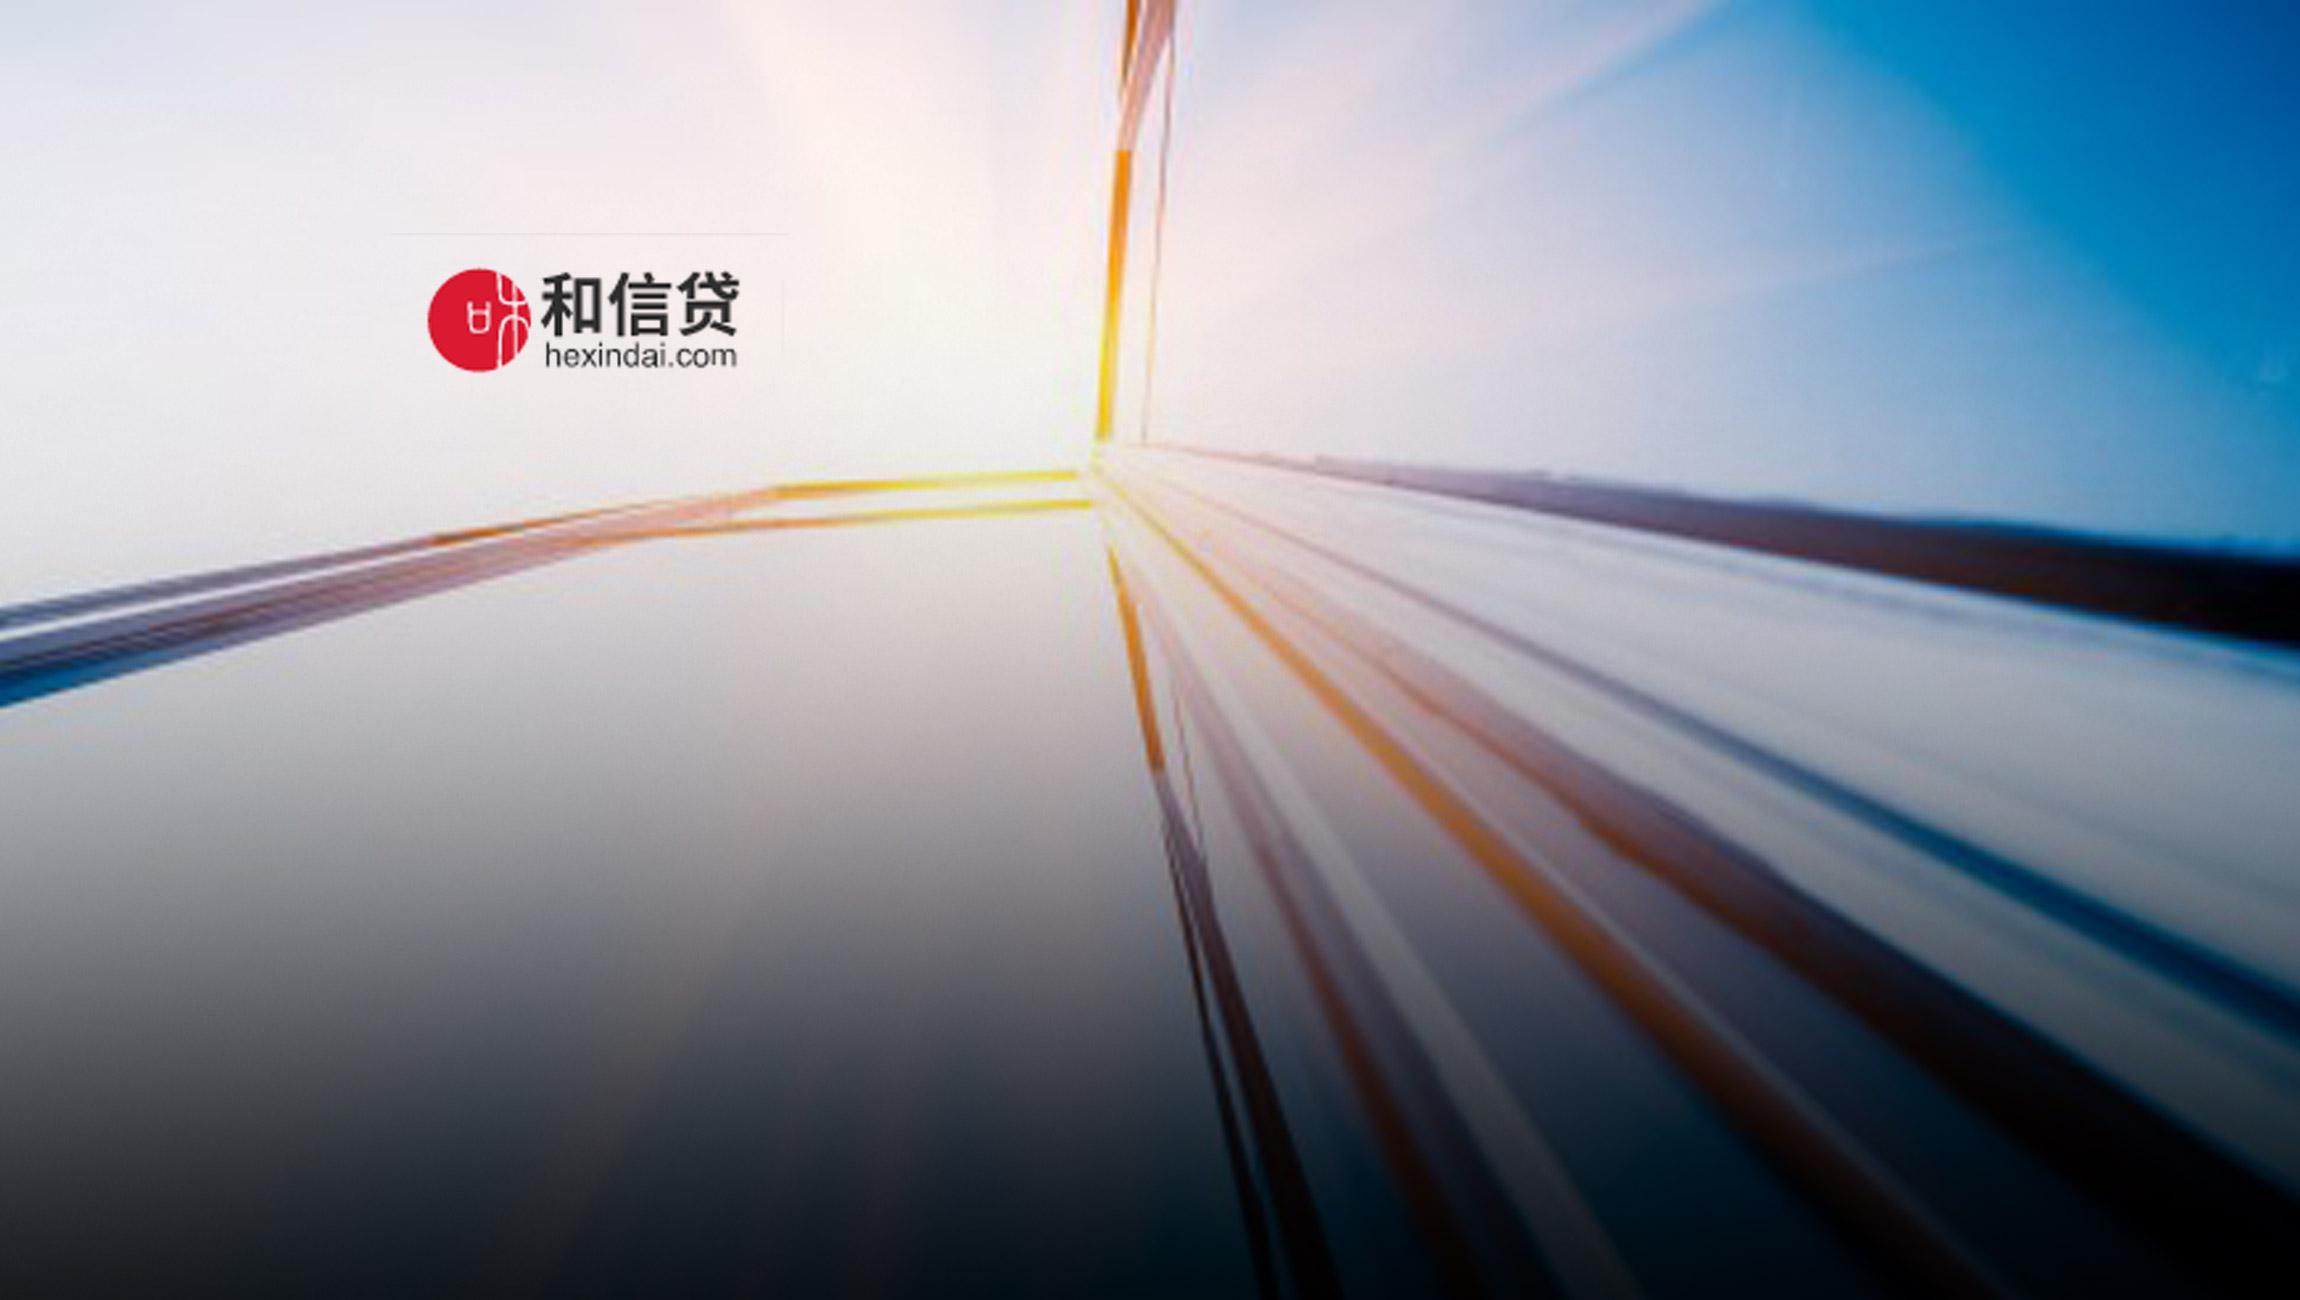 Hexindai Launches Elite Influencers Program on Xiaobai Maimai